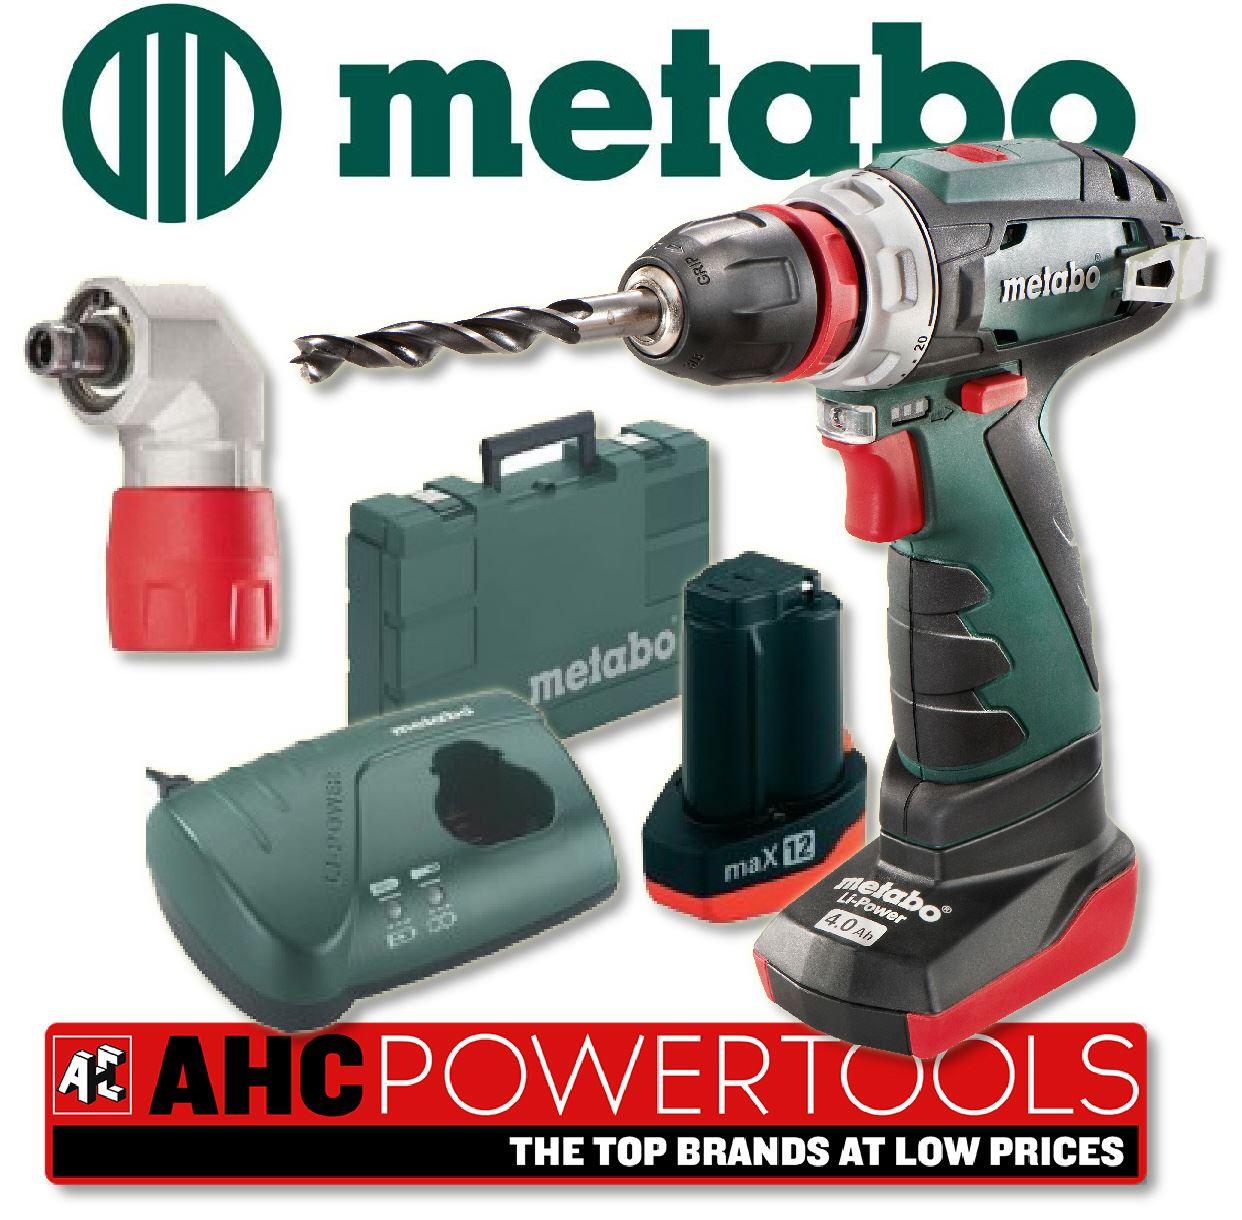 Metabo 10.8V PowerMaxx BS Quick Pro Cordless Drill 2ah & 4ah Batteries   eBay